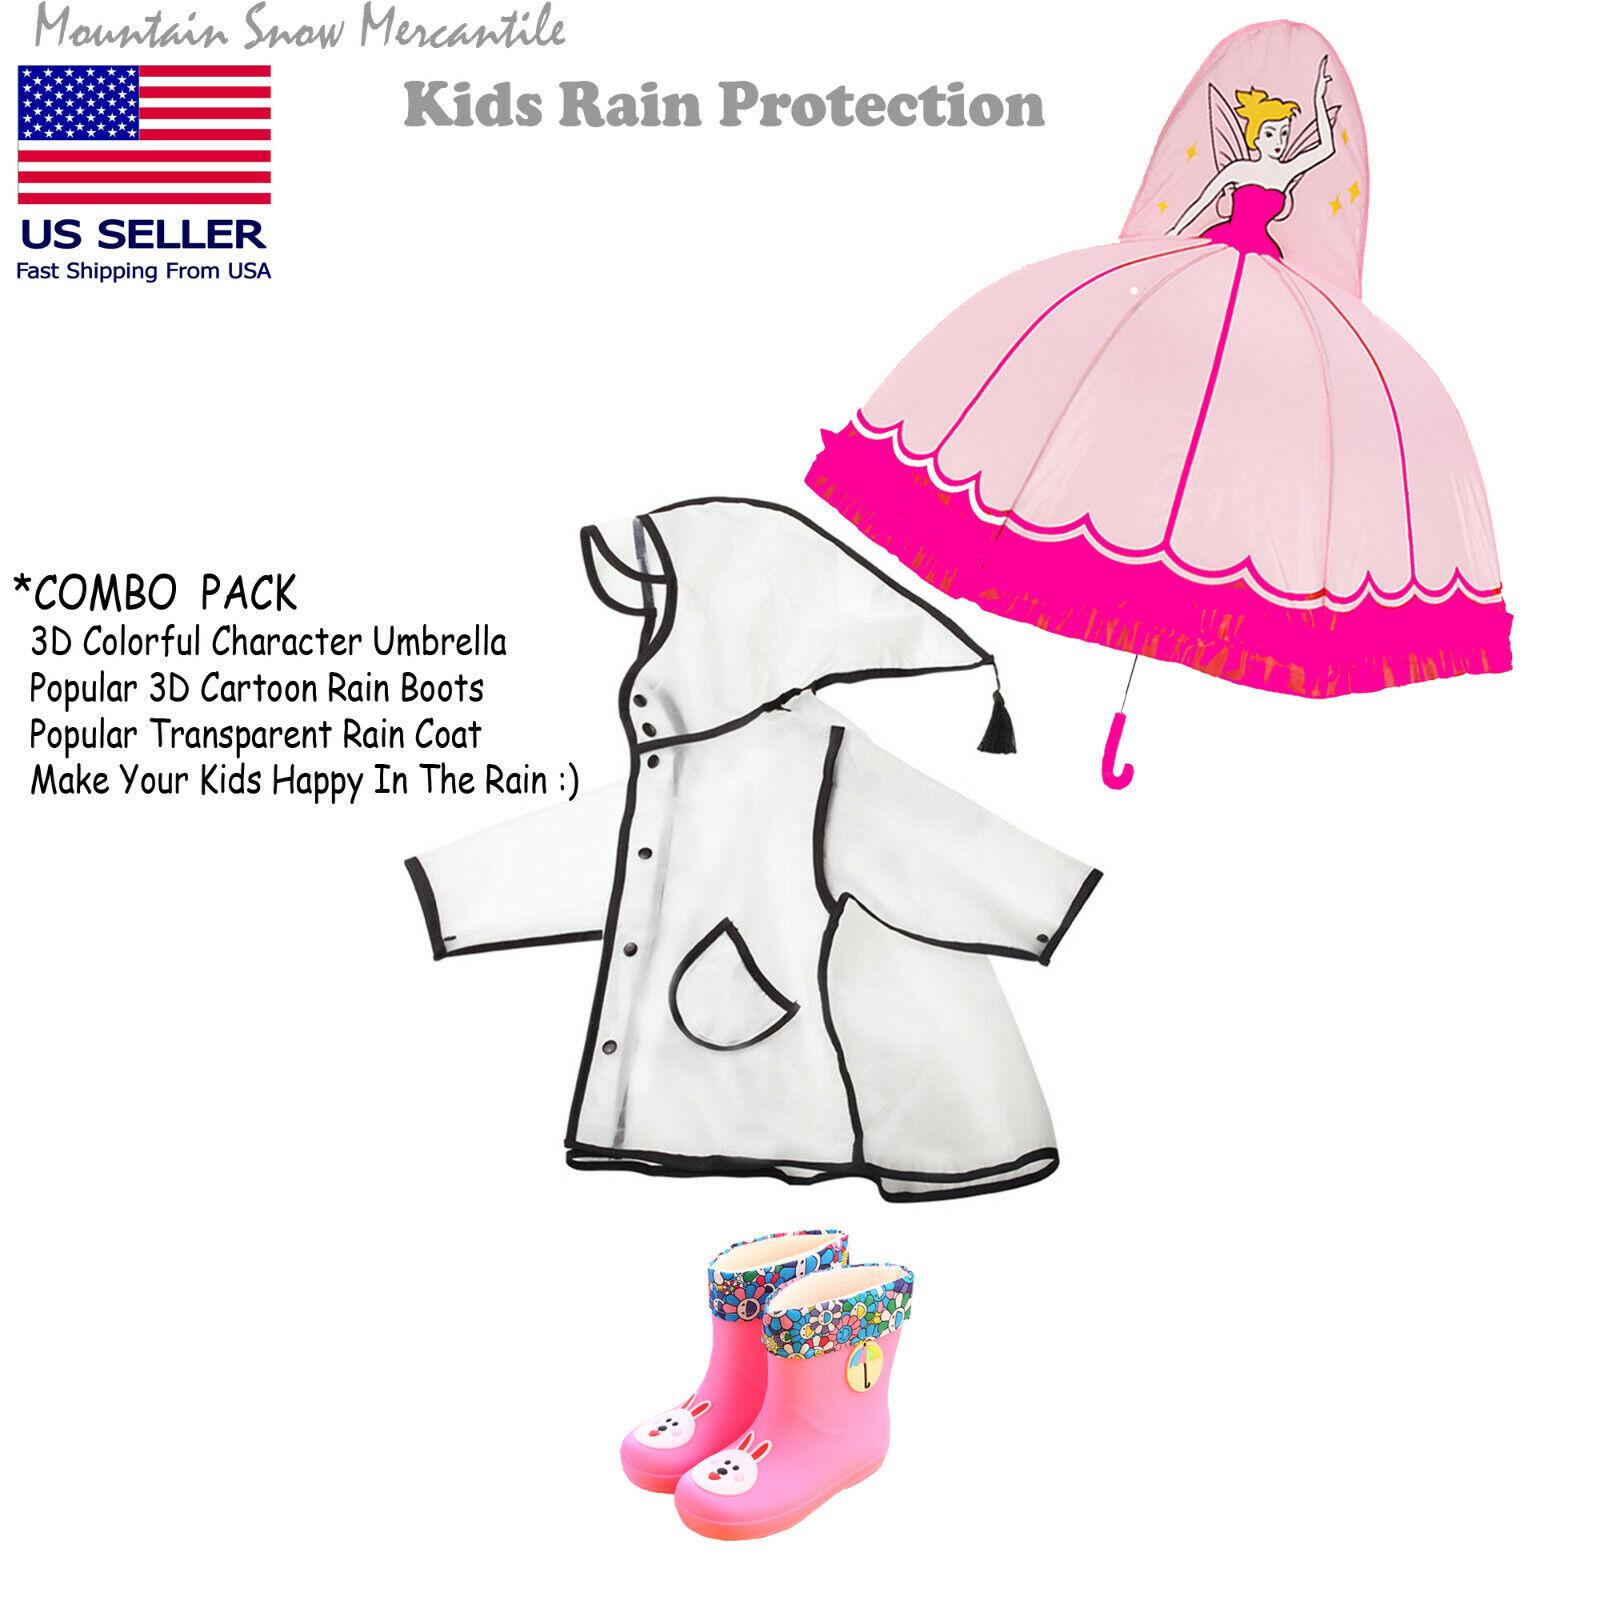 Raincoat+3D Fairy Umbrella+Pink Rain Boots Combo Pack For Ch